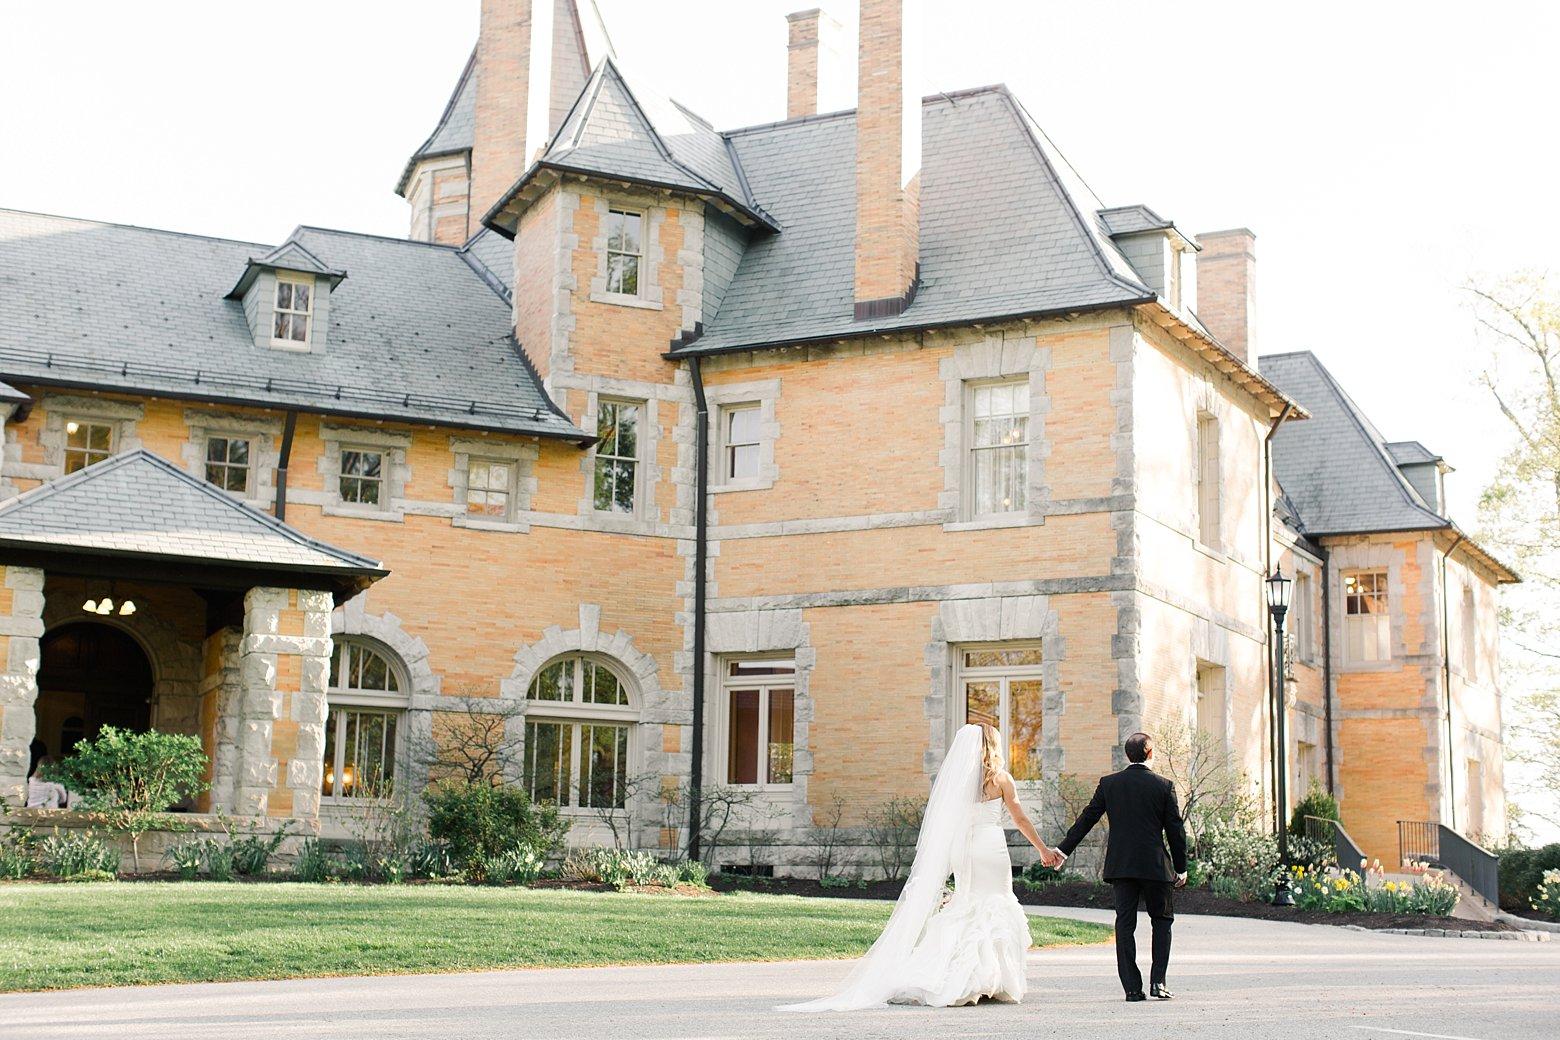 lauren_fair_photography_april_lynn_designs_stasia_matt_spring_cairnwood_estate_wedding_northeast_philadelphia_blush_pink_gold_wedding_invitation_stationery_0134